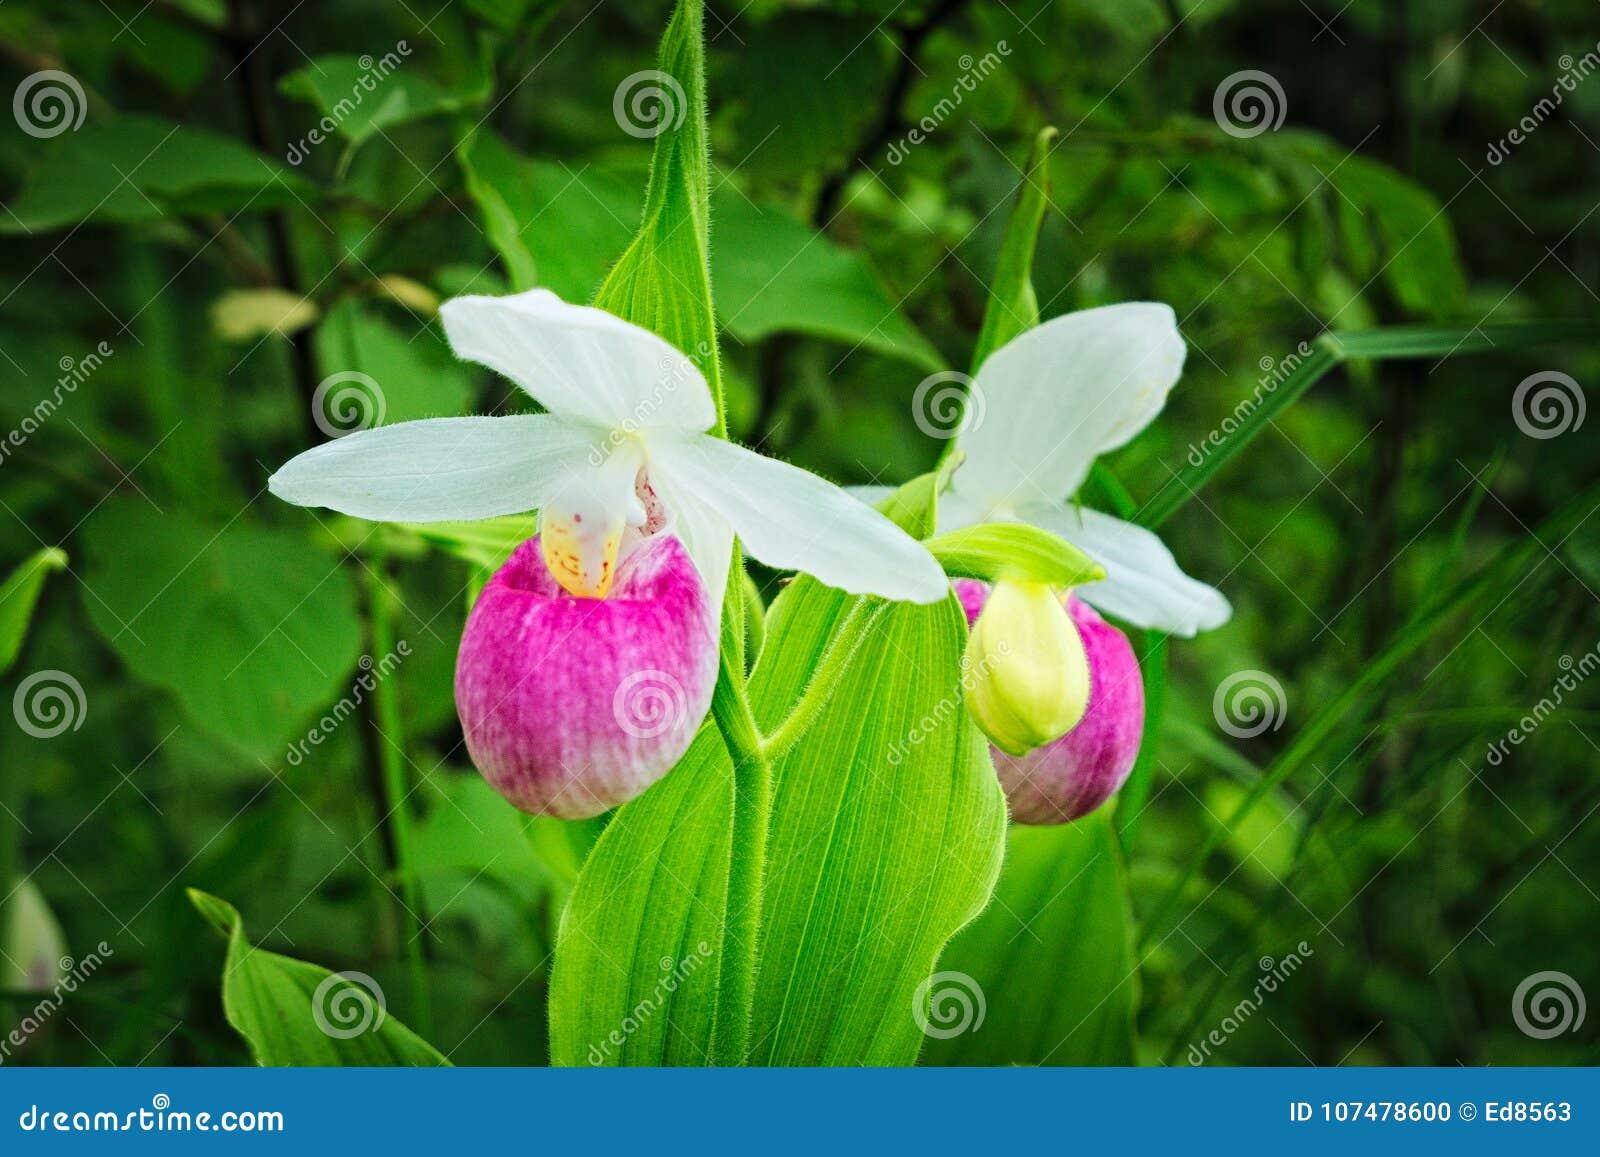 Showy Ladys Slipper Cypripedium Reginae Minnesota State Flower